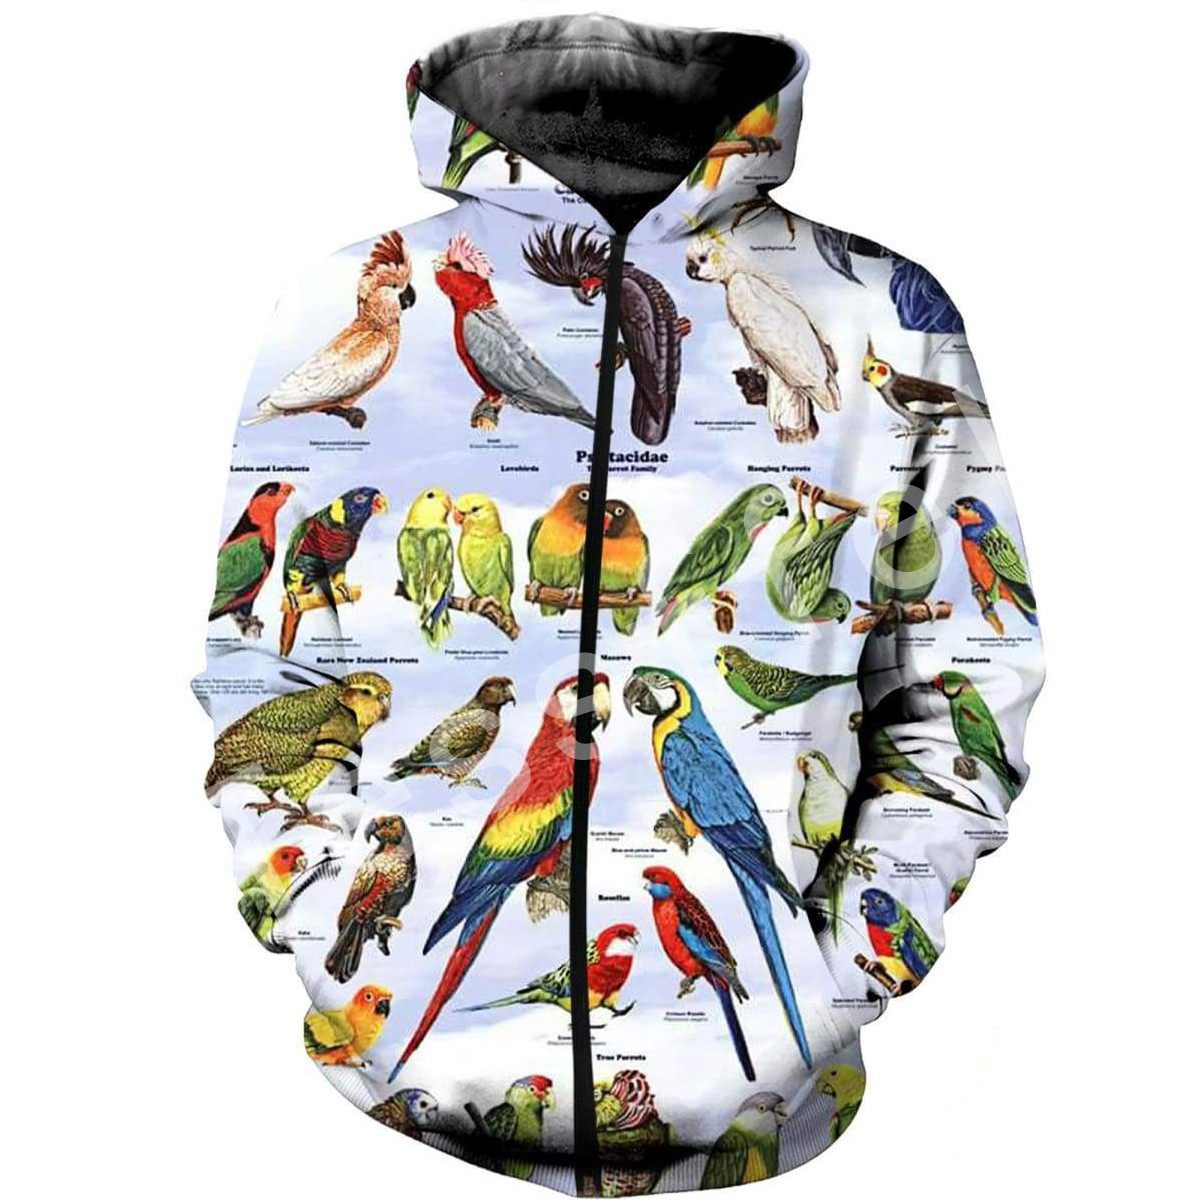 Tessffel Animal parrot Harajuku MenWomen HipHop 3Dfull Printed Sweatshirts Hoodie shirts Jacket Casual fit colorful camo Style4 in Hoodies amp Sweatshirts from Men 39 s Clothing